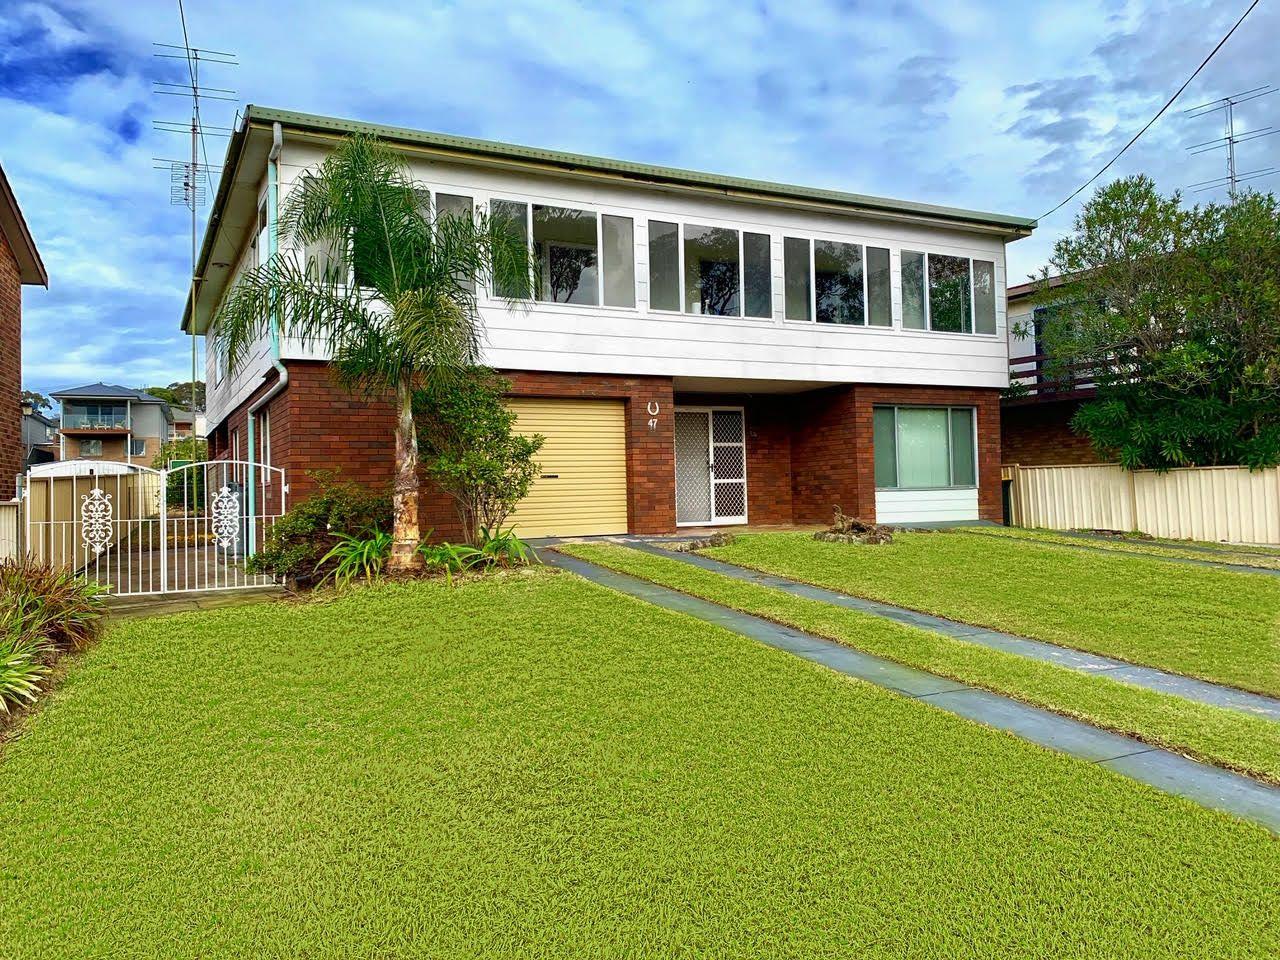 47 Excellent Street, Vincentia NSW 2540, Image 0